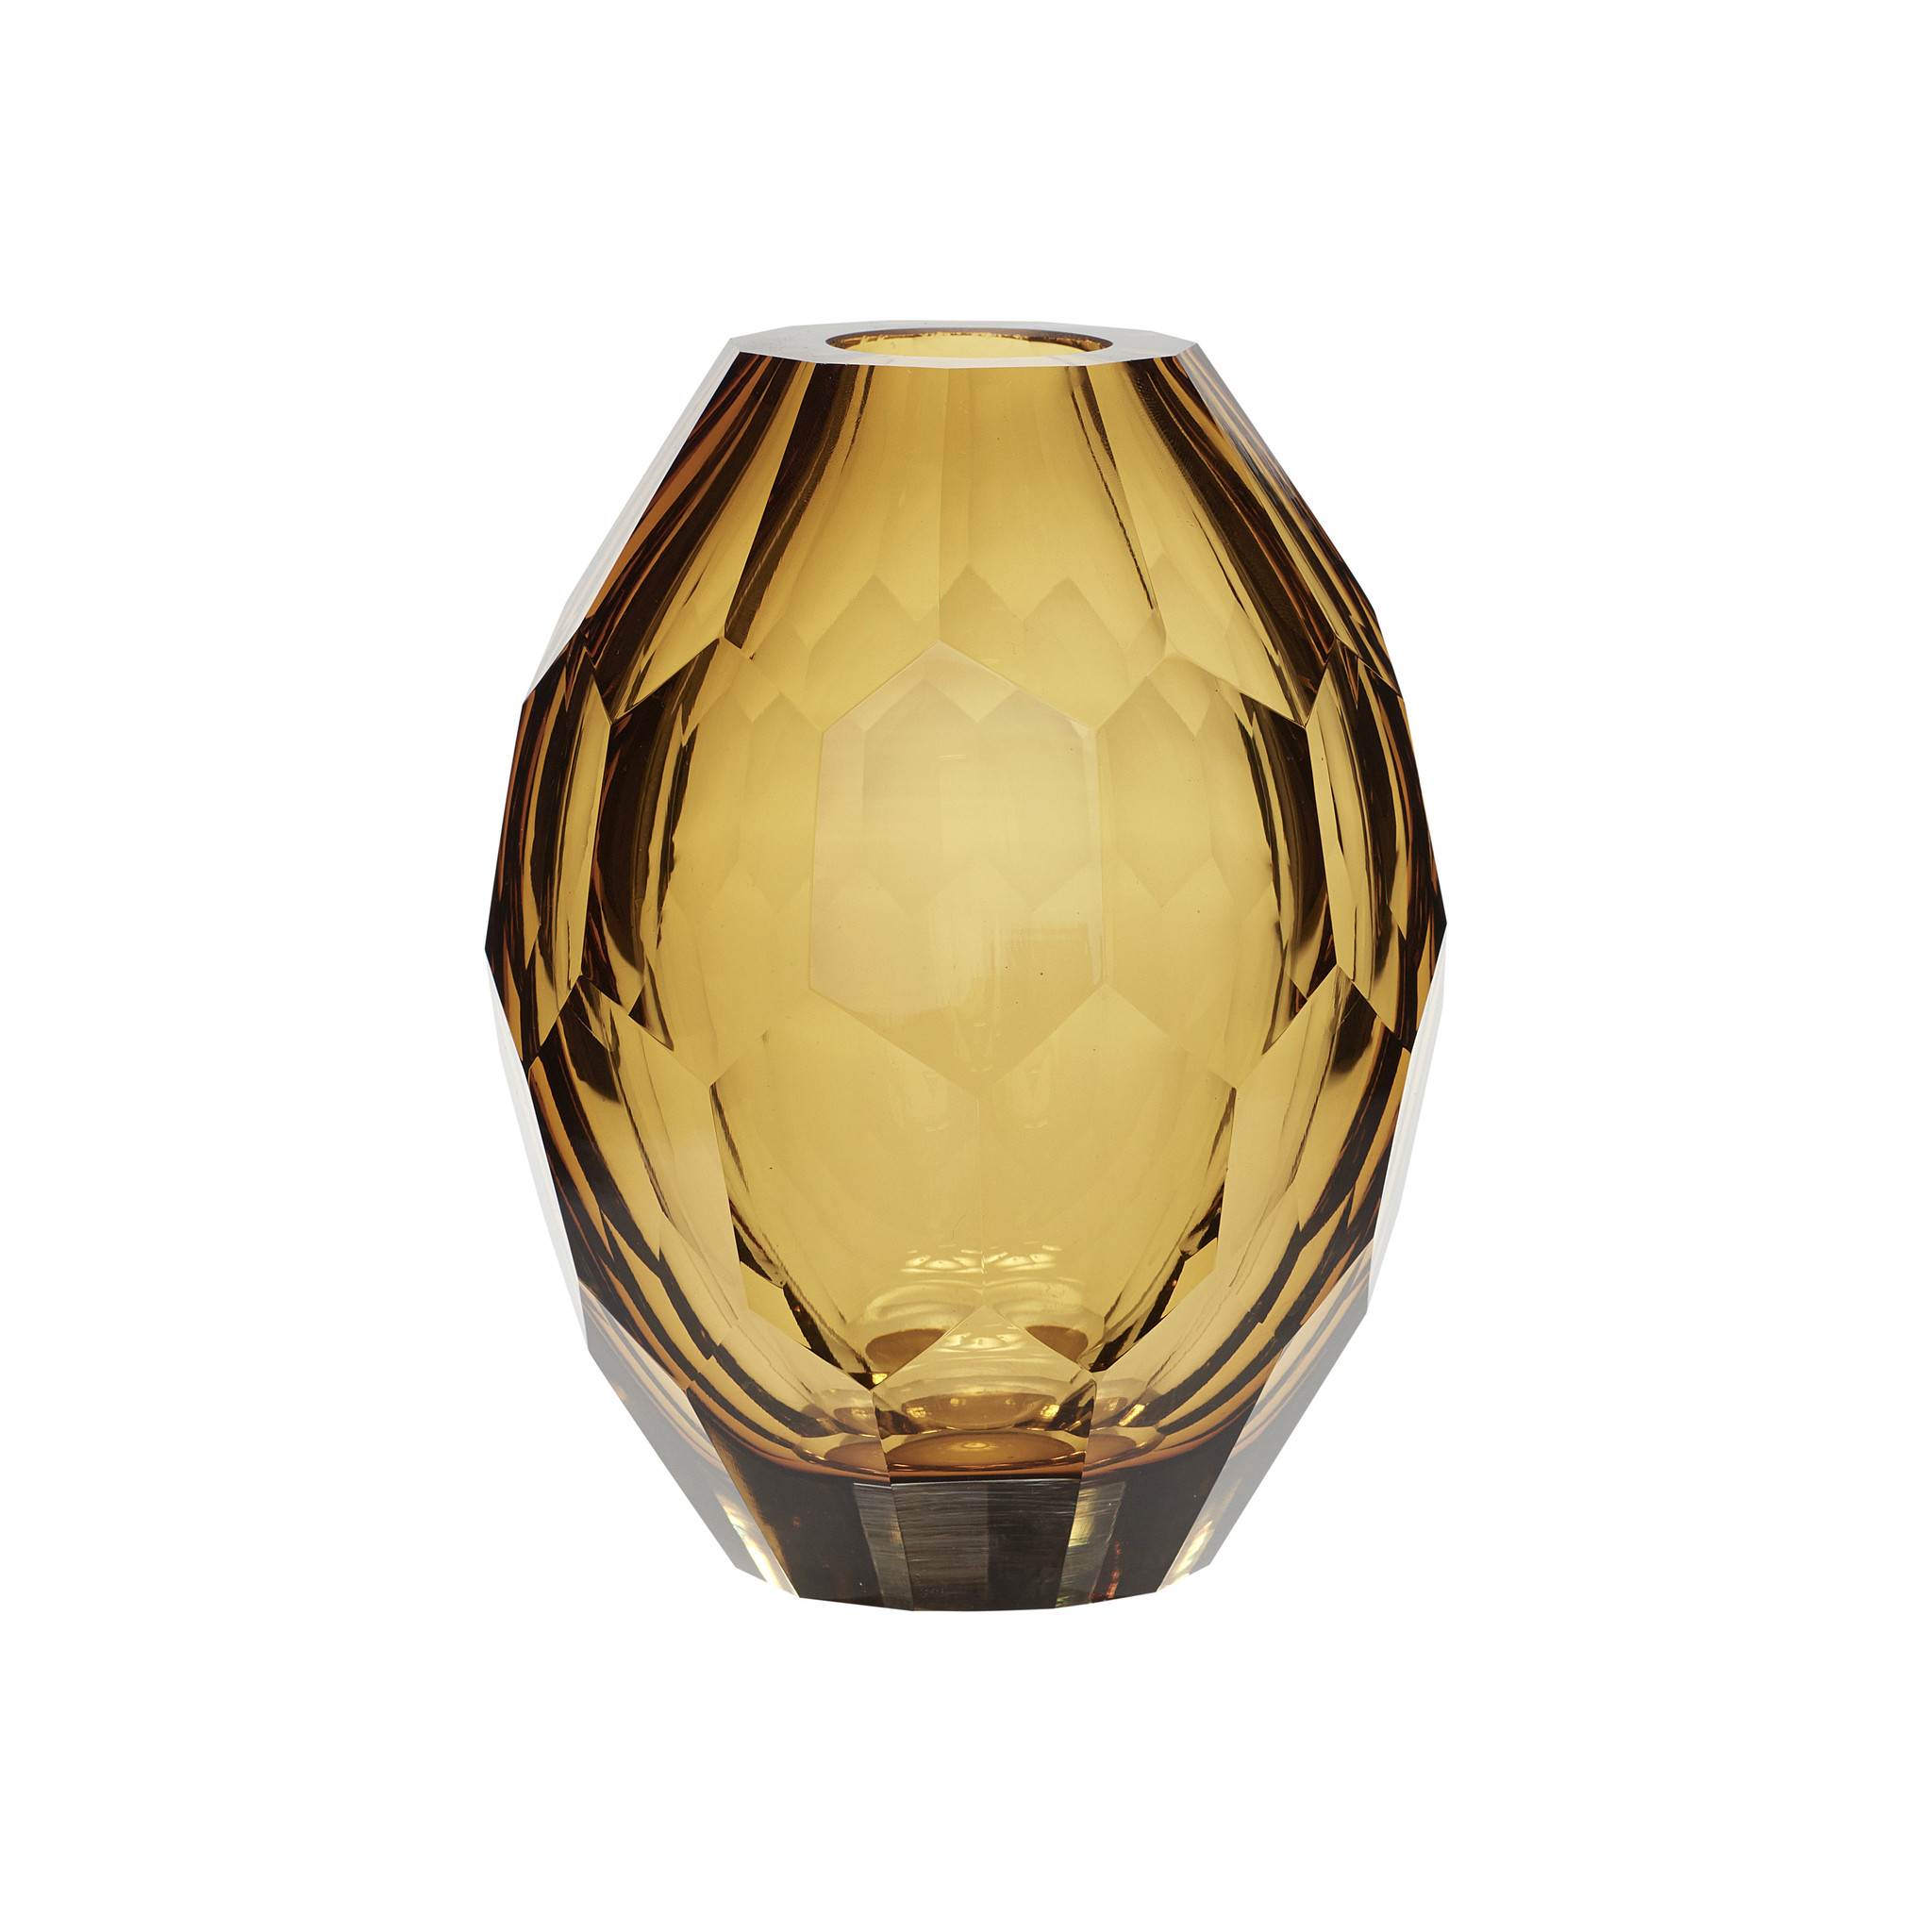 Hubsch Vaas, glas, helder / geel-950503-5712772060735